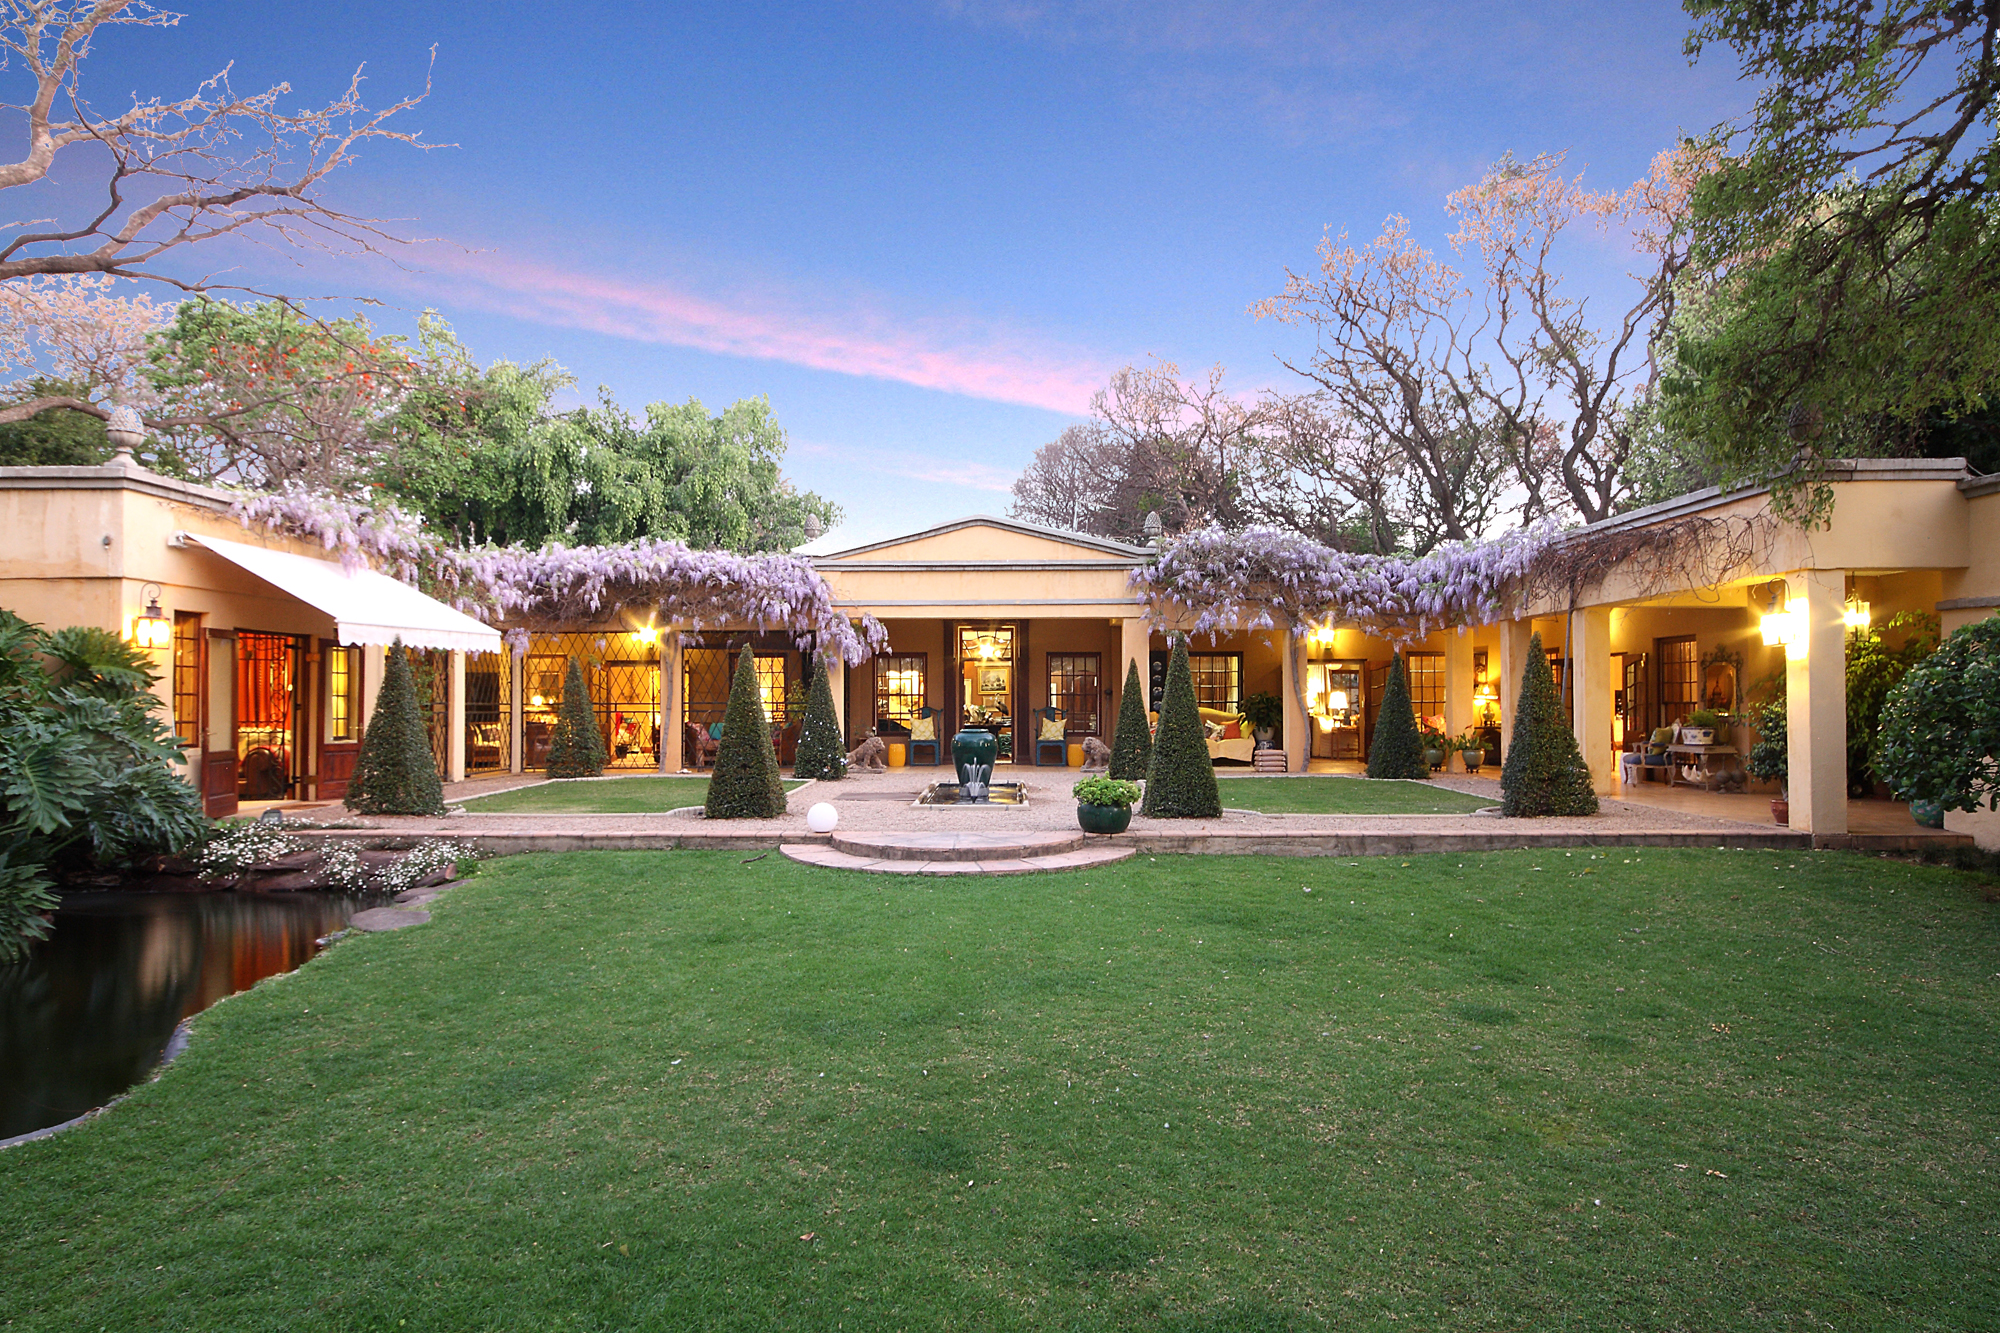 Moradia para Venda às A Contempoary Home Other Gauteng, Gauteng África Do Sul